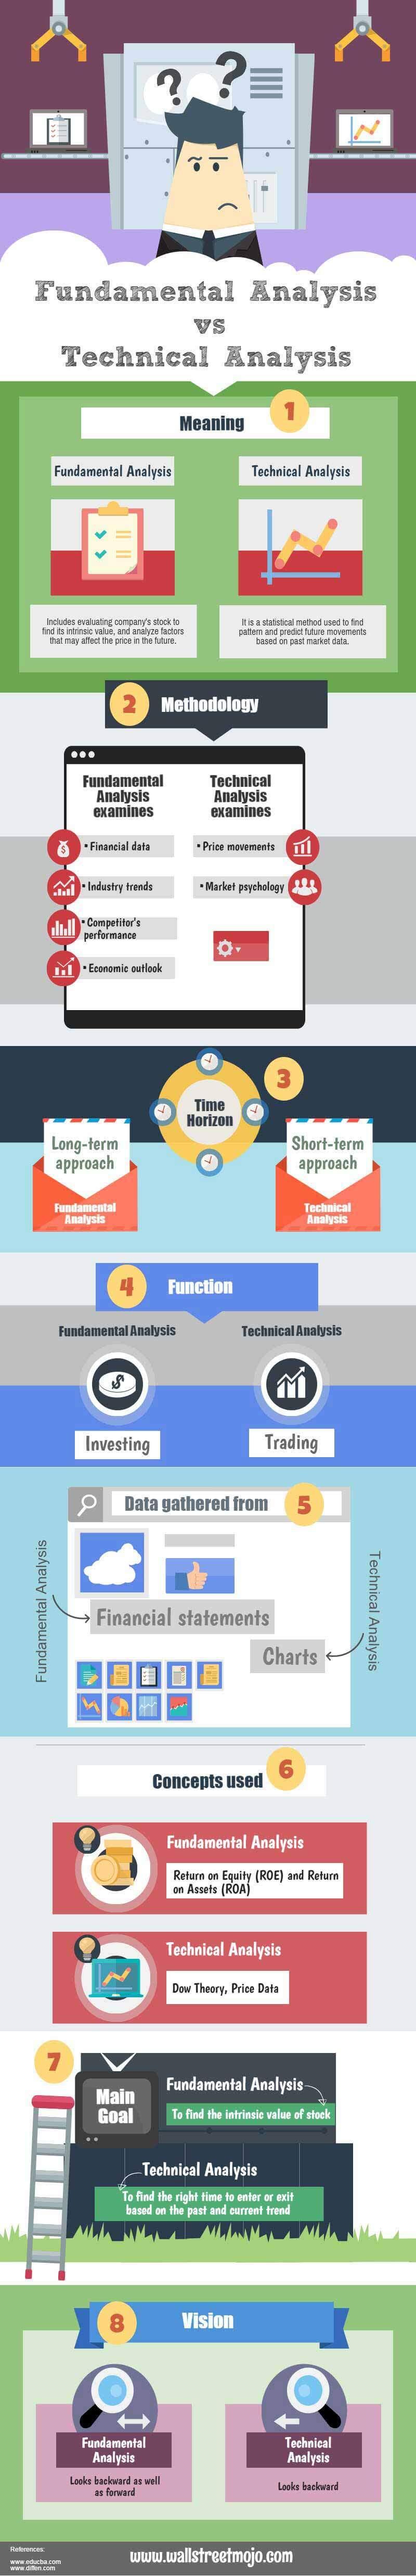 Fundamental analysis vs technical analysis infographics